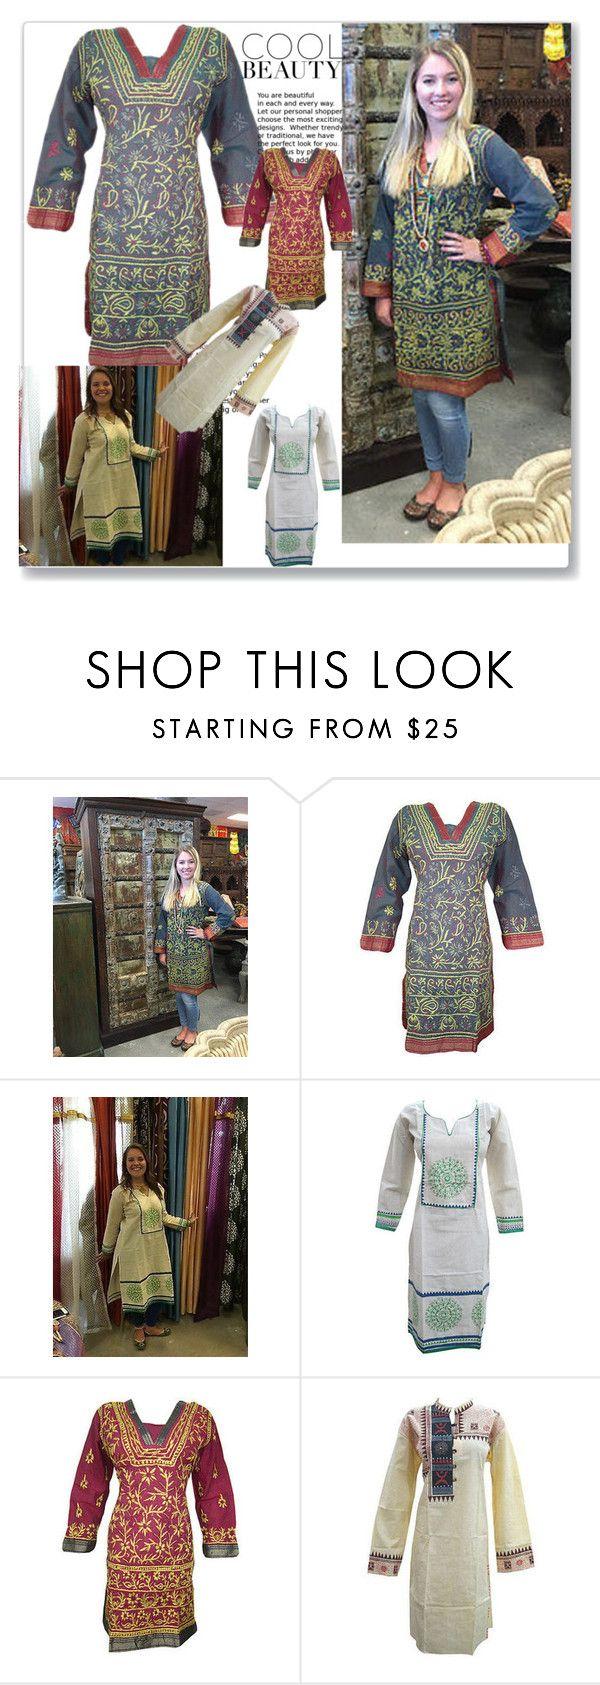 New Year Fashion by baydeals on Polyvore   http://stores.ebay.com/mogulgallery/DESIGNER-KURTI-/_i.html?_fsub=665889019&_sid=3781319&_trksid=p4634.c0.m322